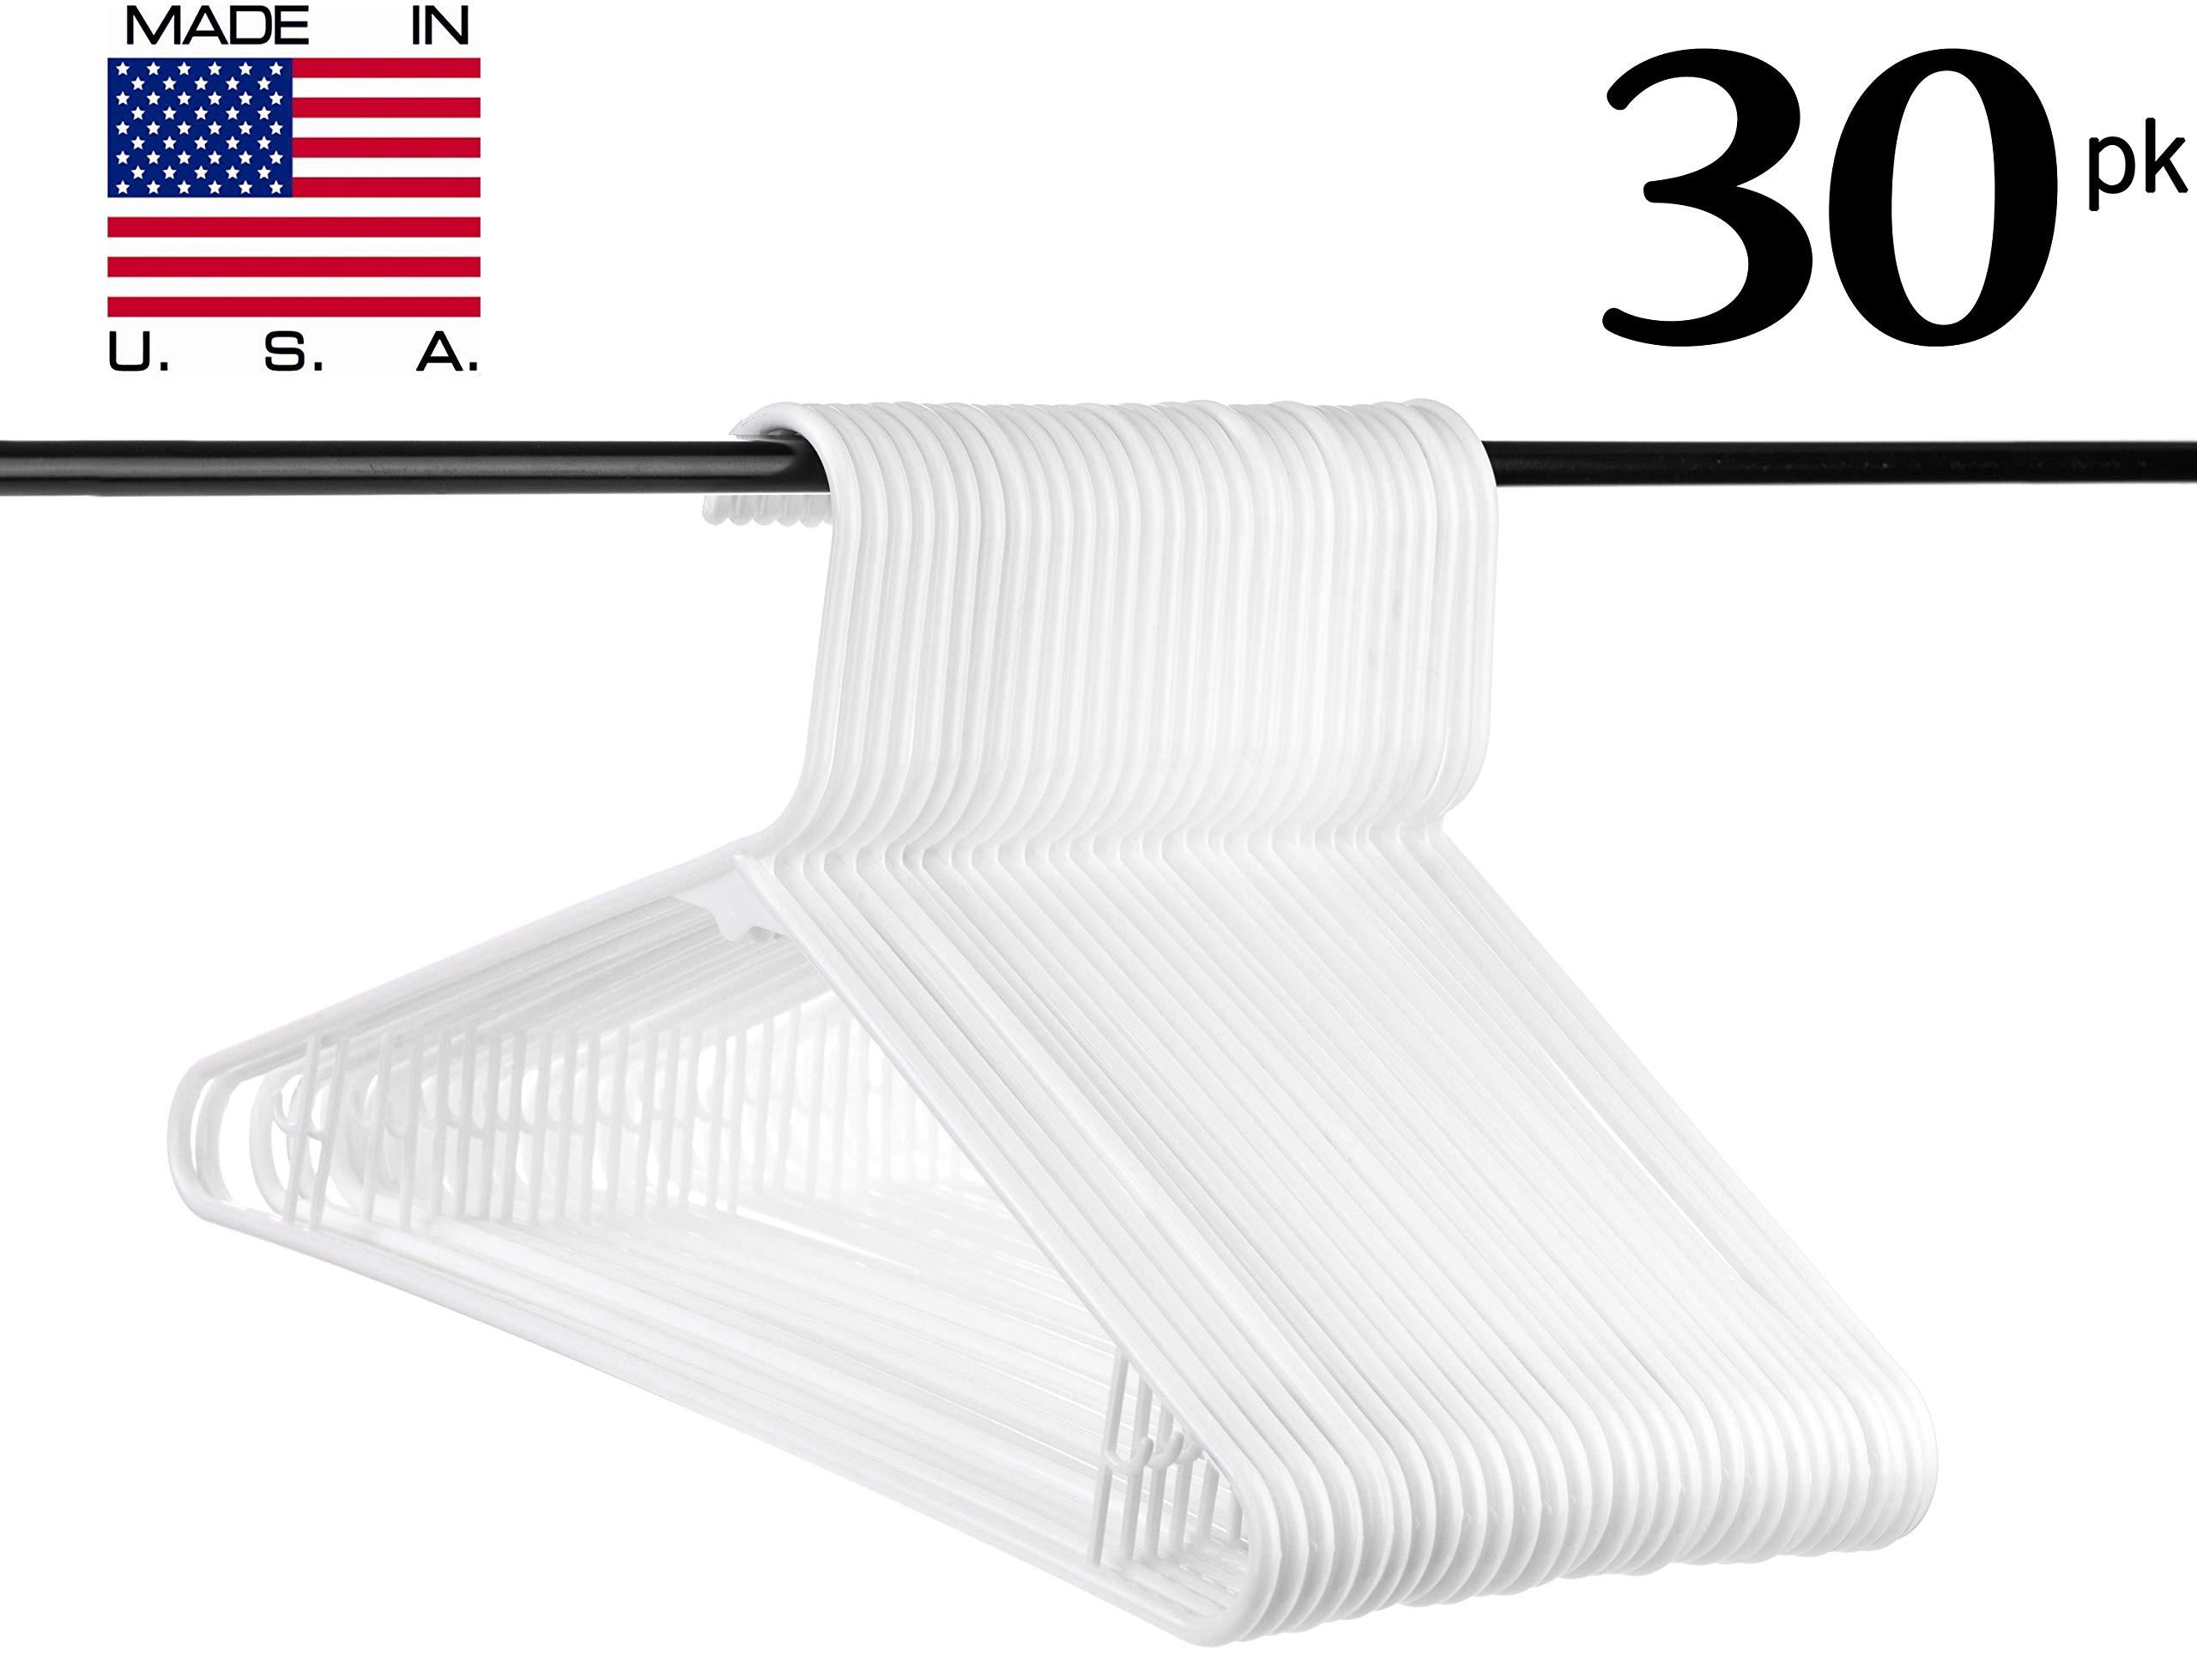 Neaties USA Made White Plastic Hangers with Bar Hooks, 30pk